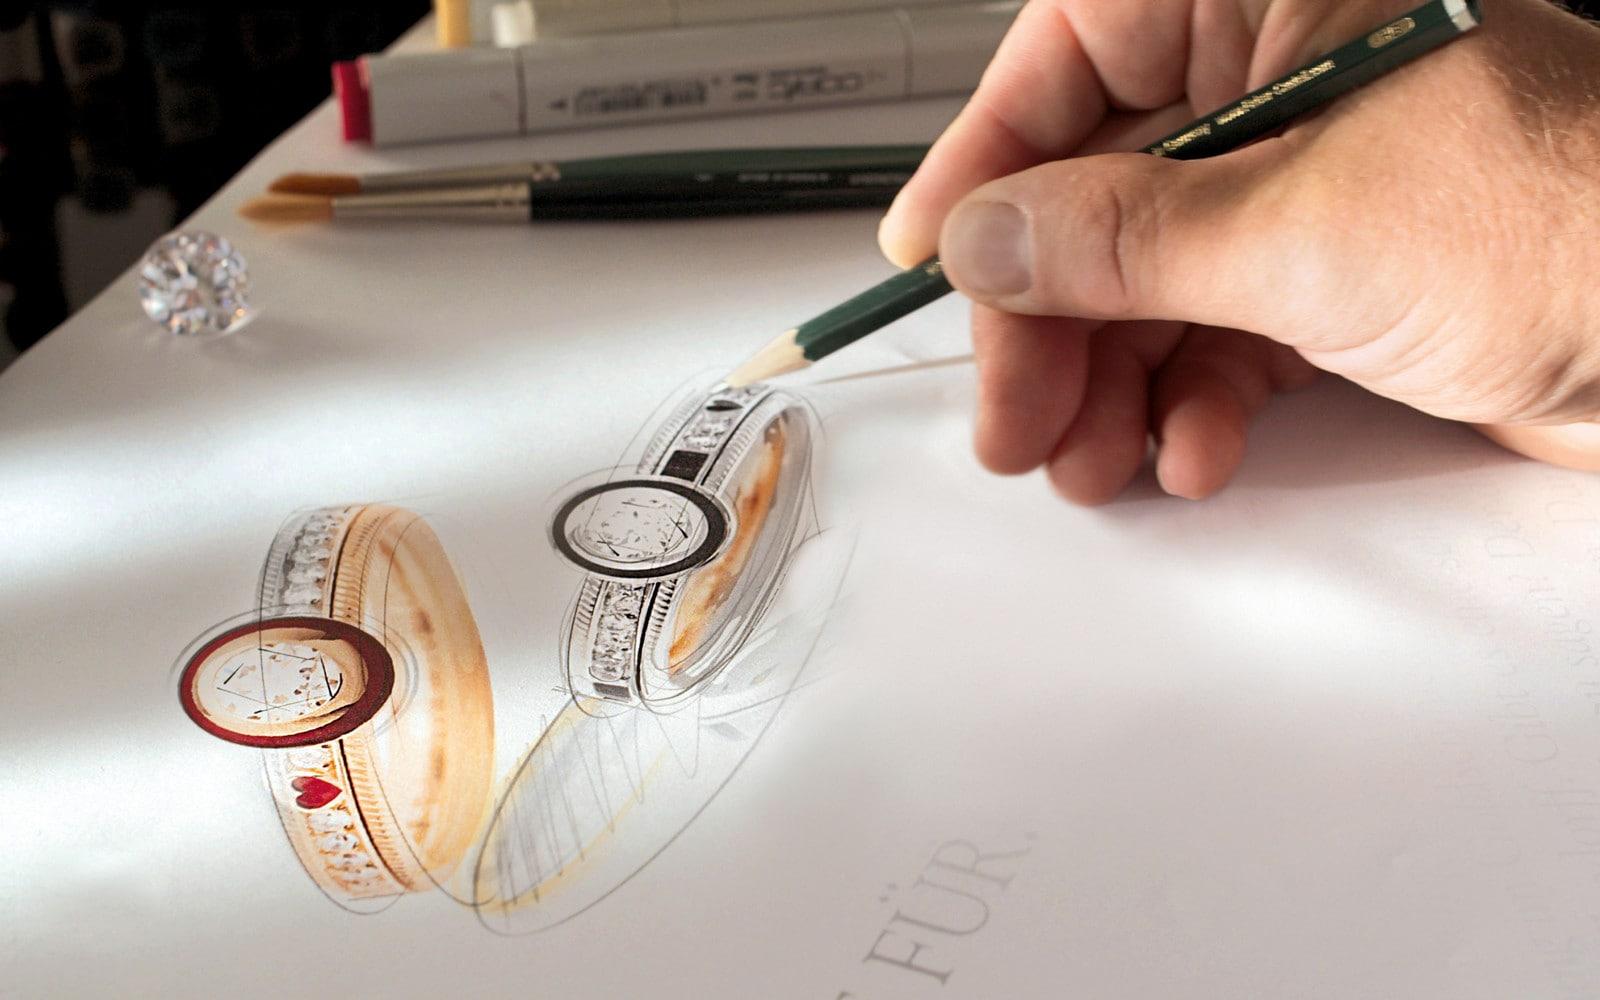 Sketches of Wellendorff rings